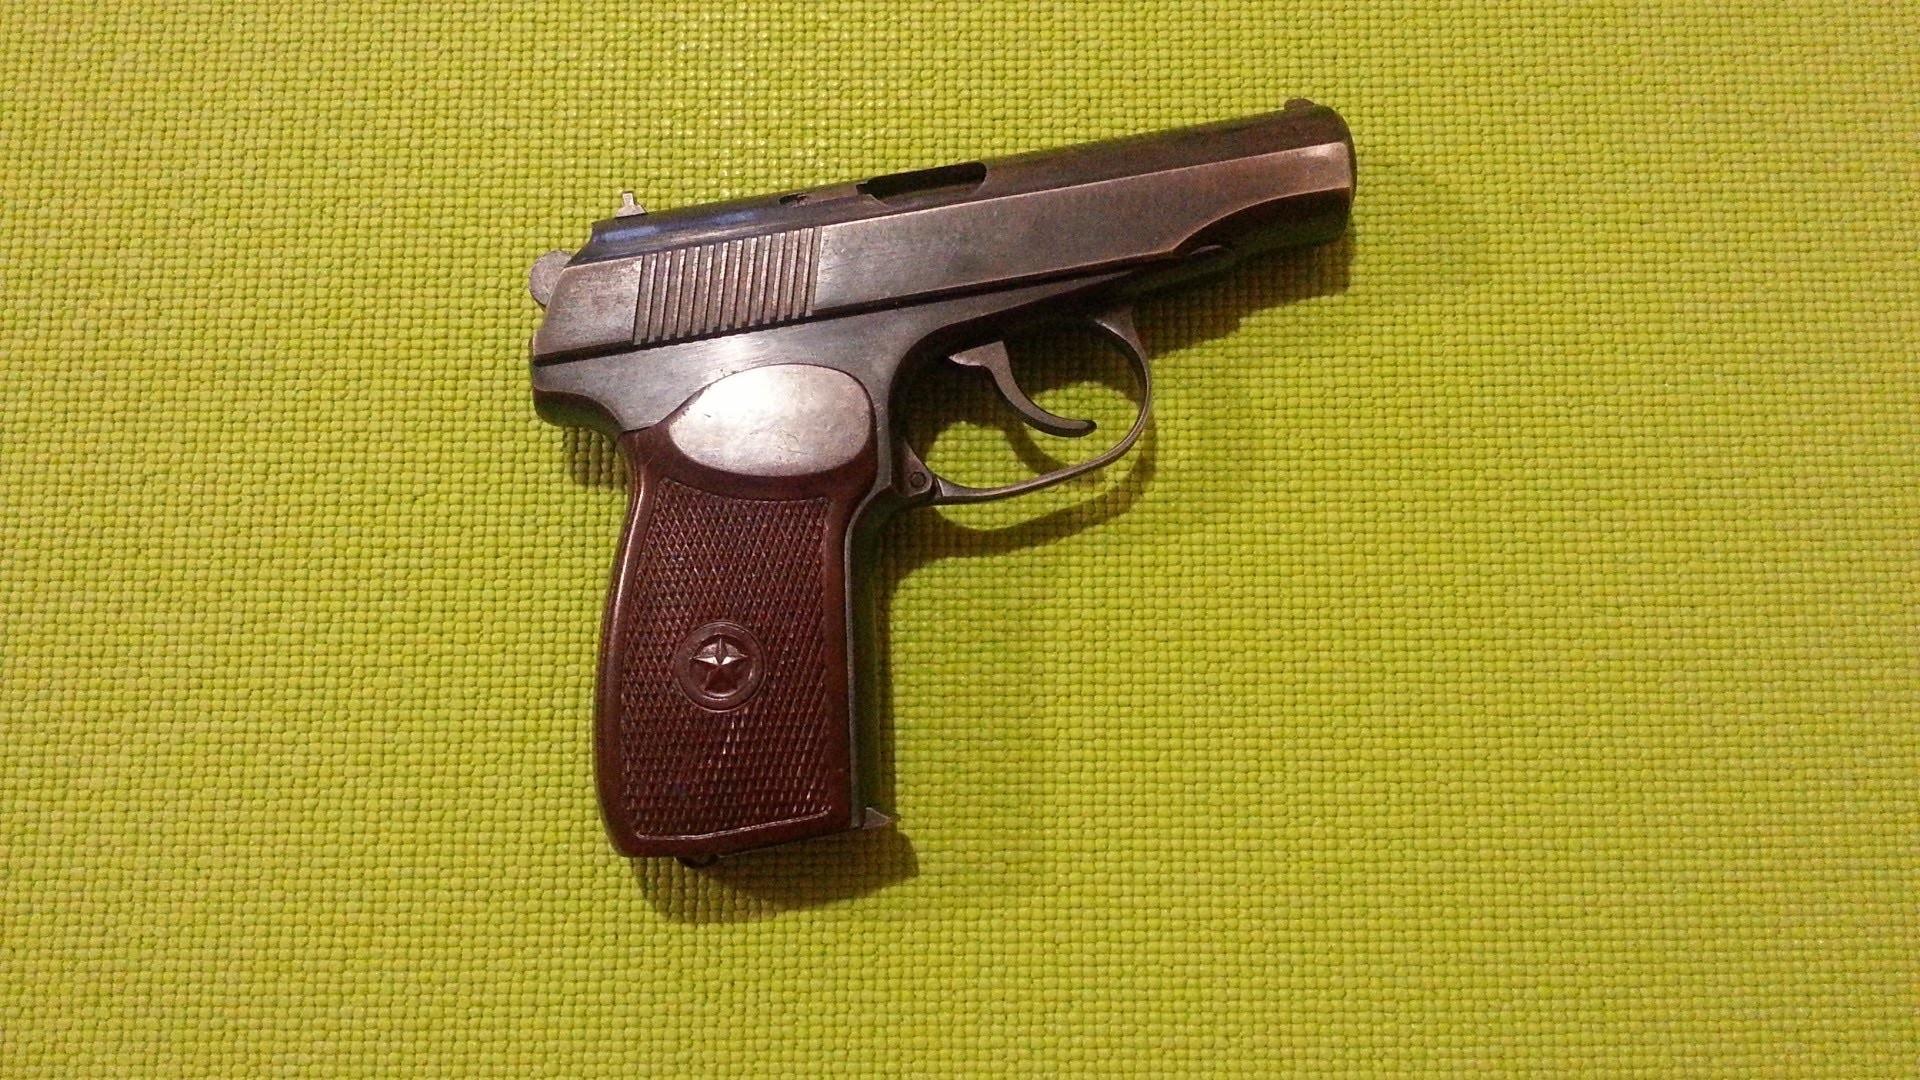 Makarov pistol (PM 9 mm) wallpaper